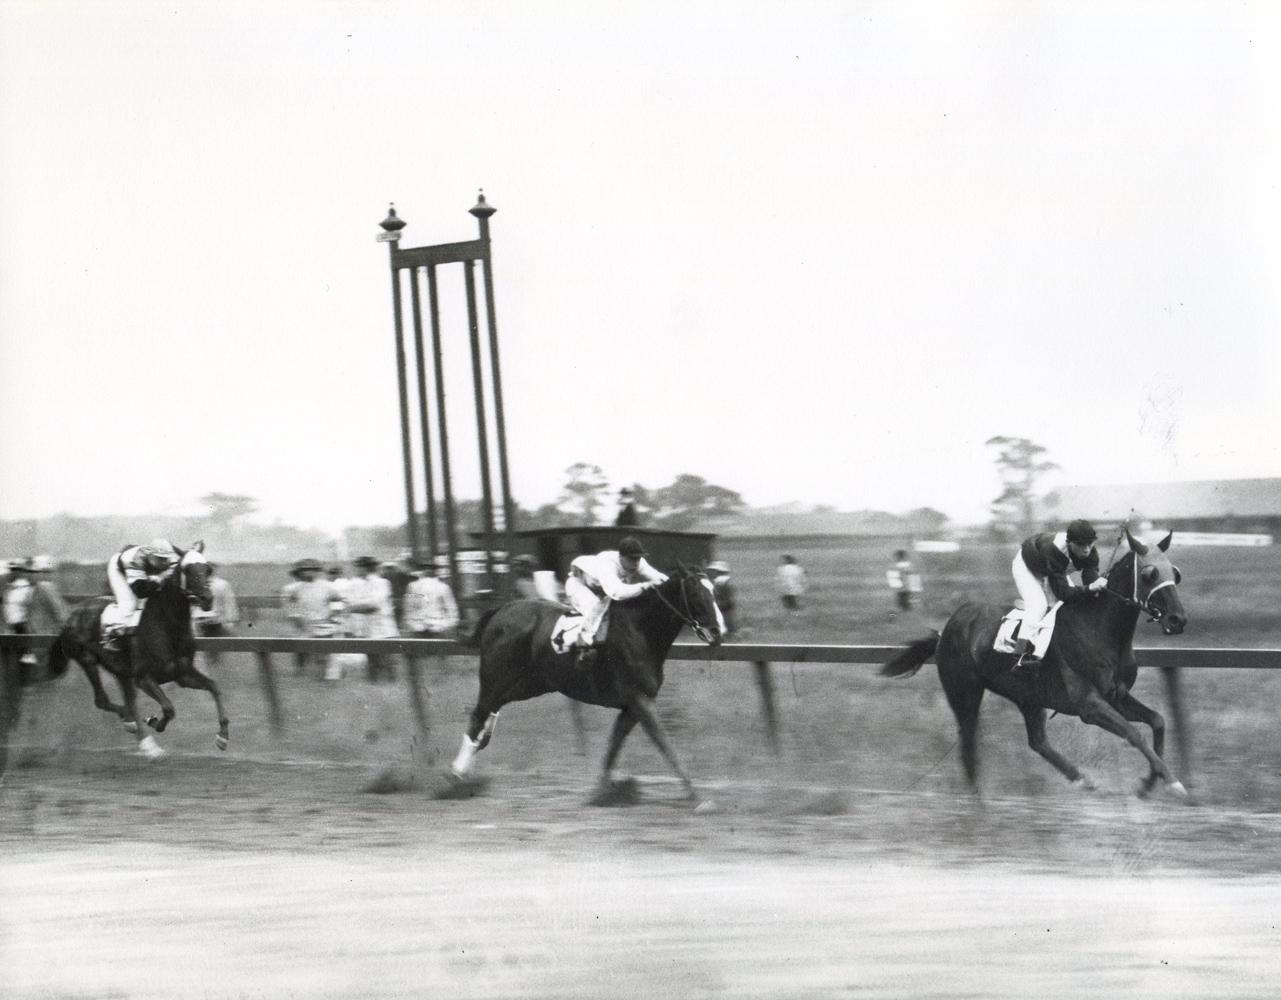 Roamer (M. Buxton up) winning the 1914 Carter Handicap at Aqueduct (Museum Collection)